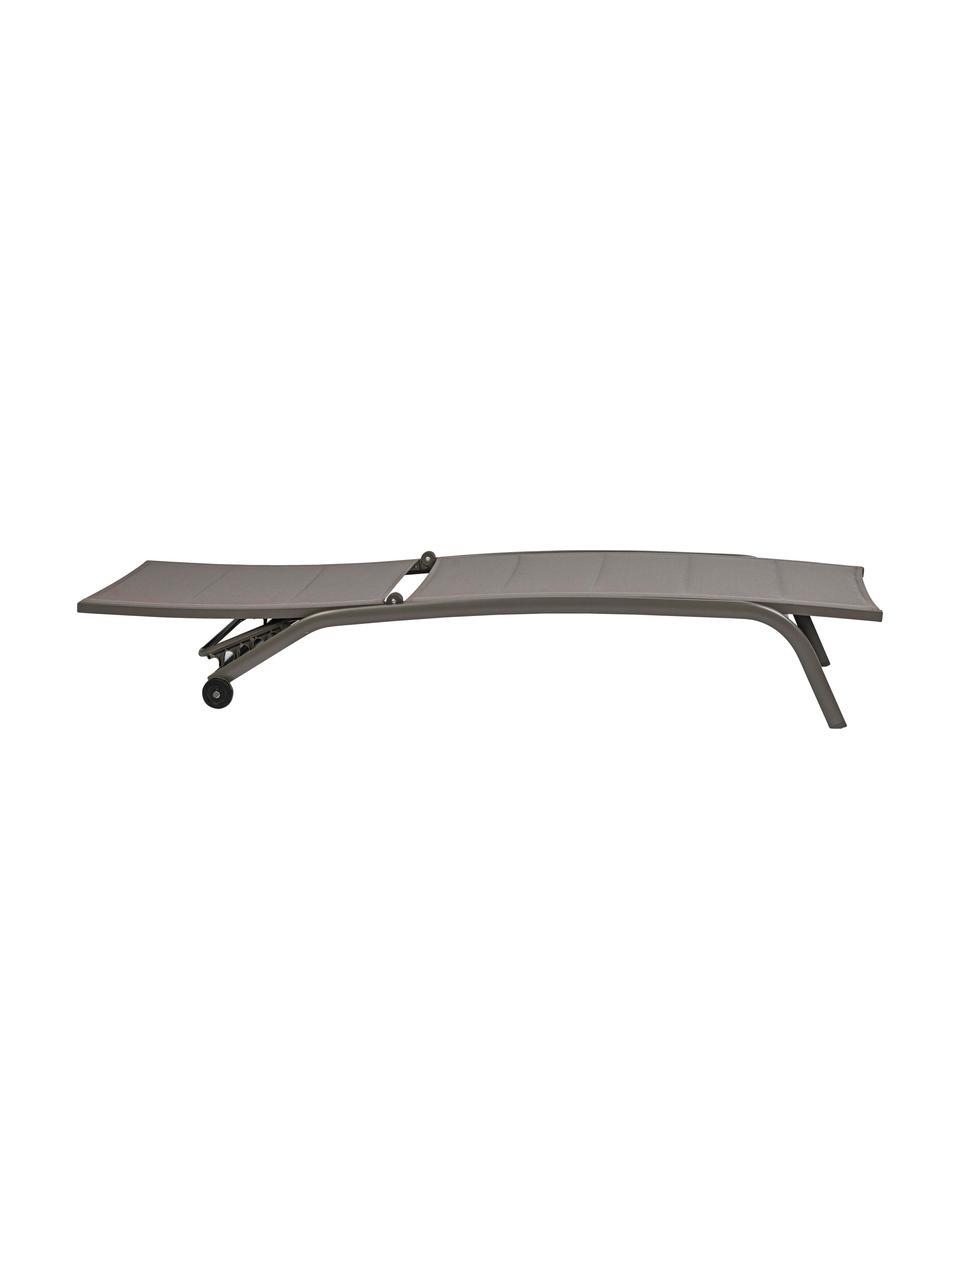 Leżak Cleo, Stelaż: aluminium malowane proszk, Szary, czarny, S 192 x G 61 cm